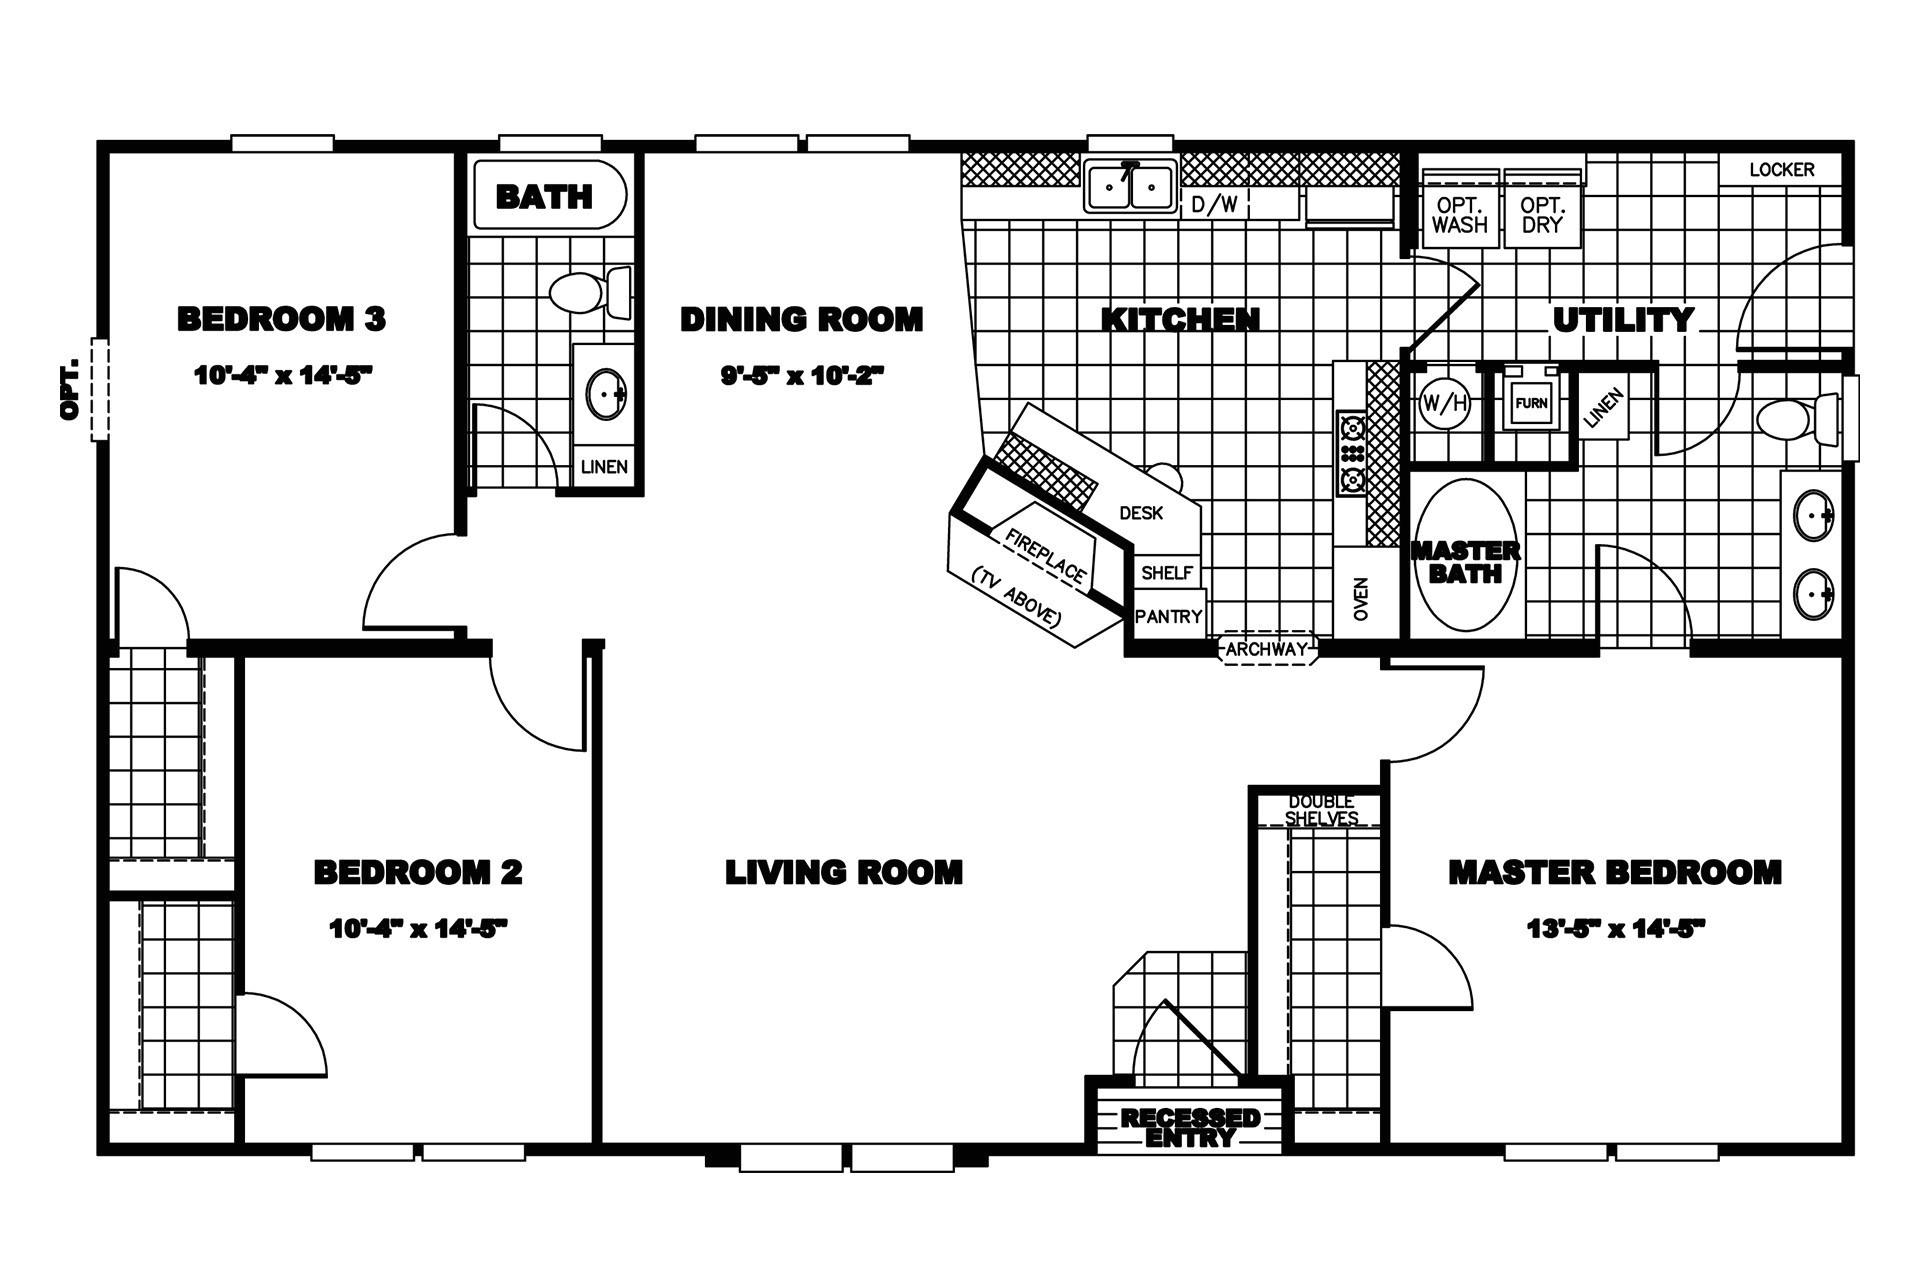 clayton homes floor plans pictures elegant 28 clayton mobile home floor plans mobile modular home